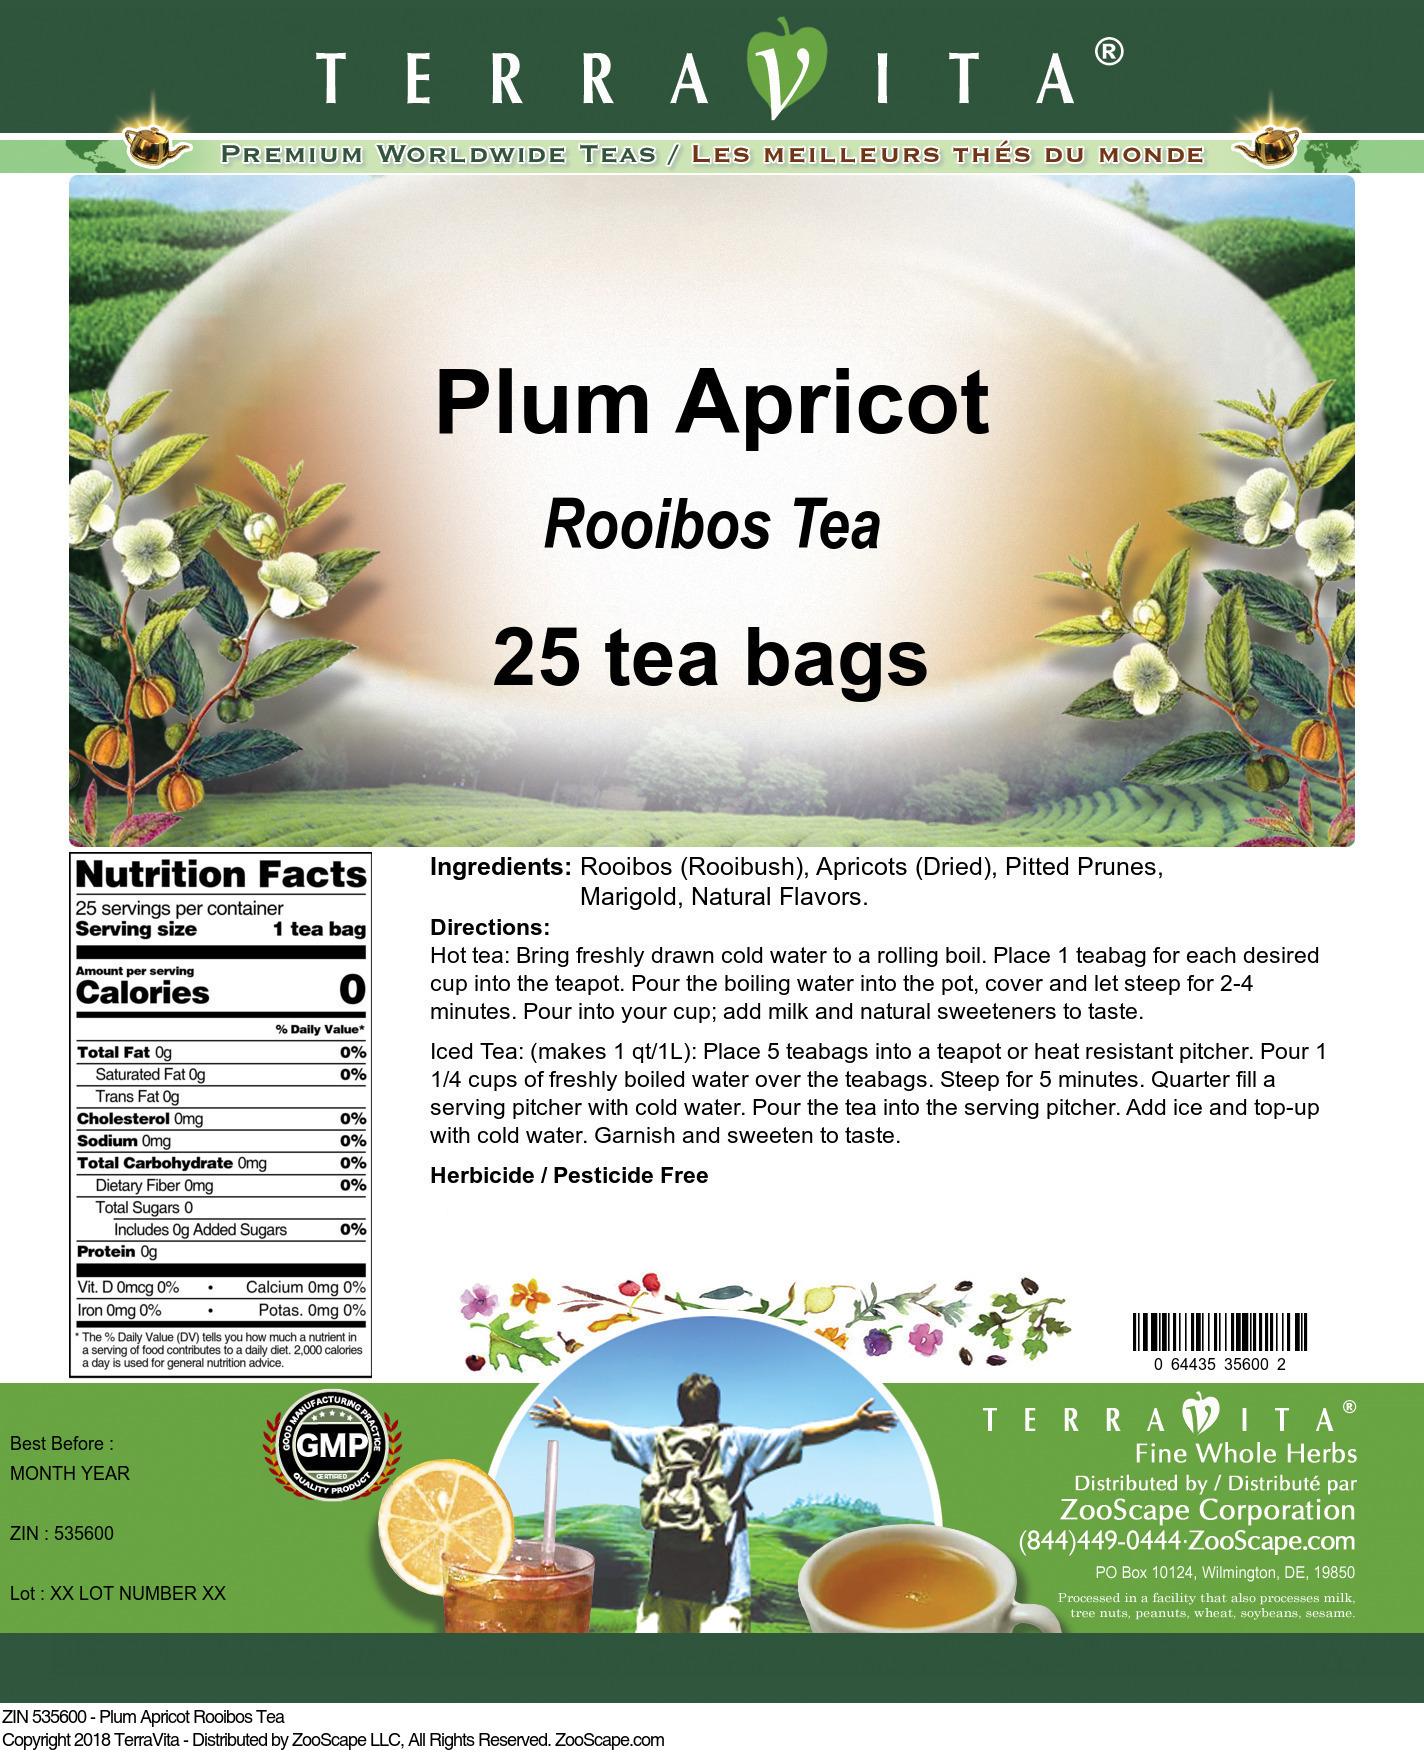 Plum Apricot Rooibos Tea